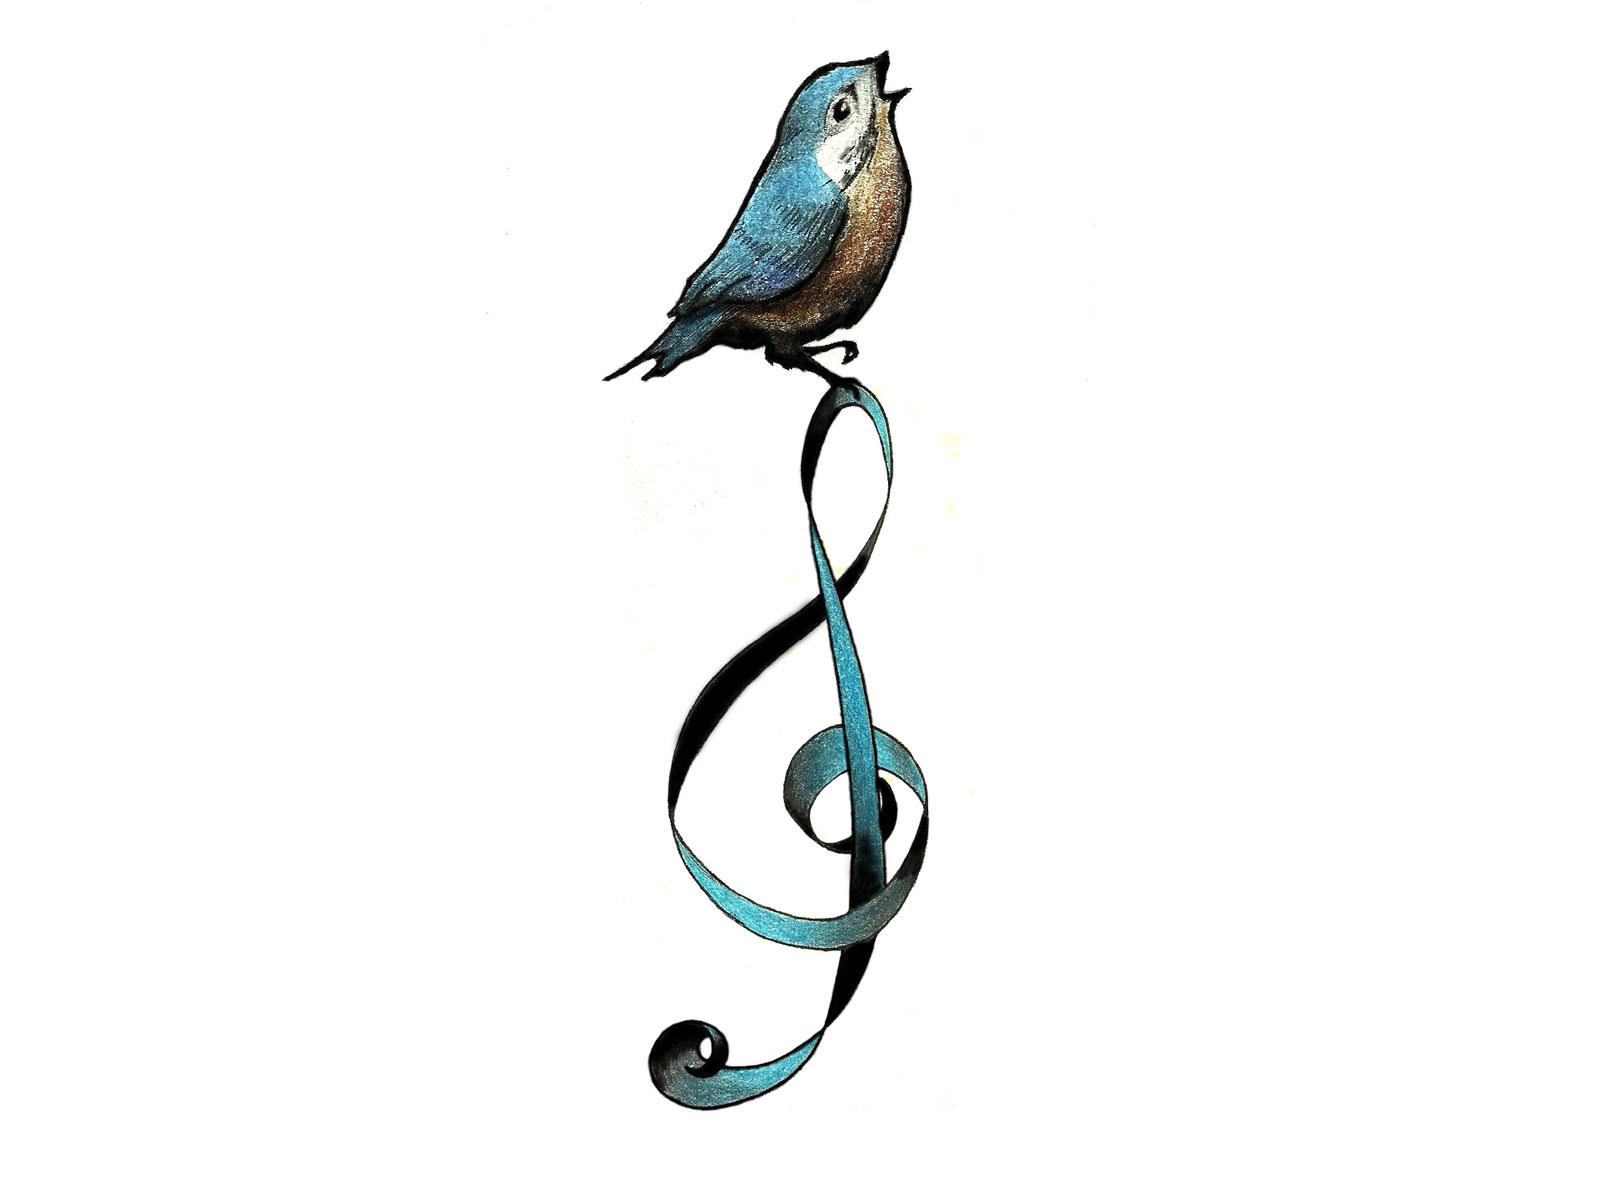 Drawn music notes bird Blue Wallpaper tattoo bird tattoo